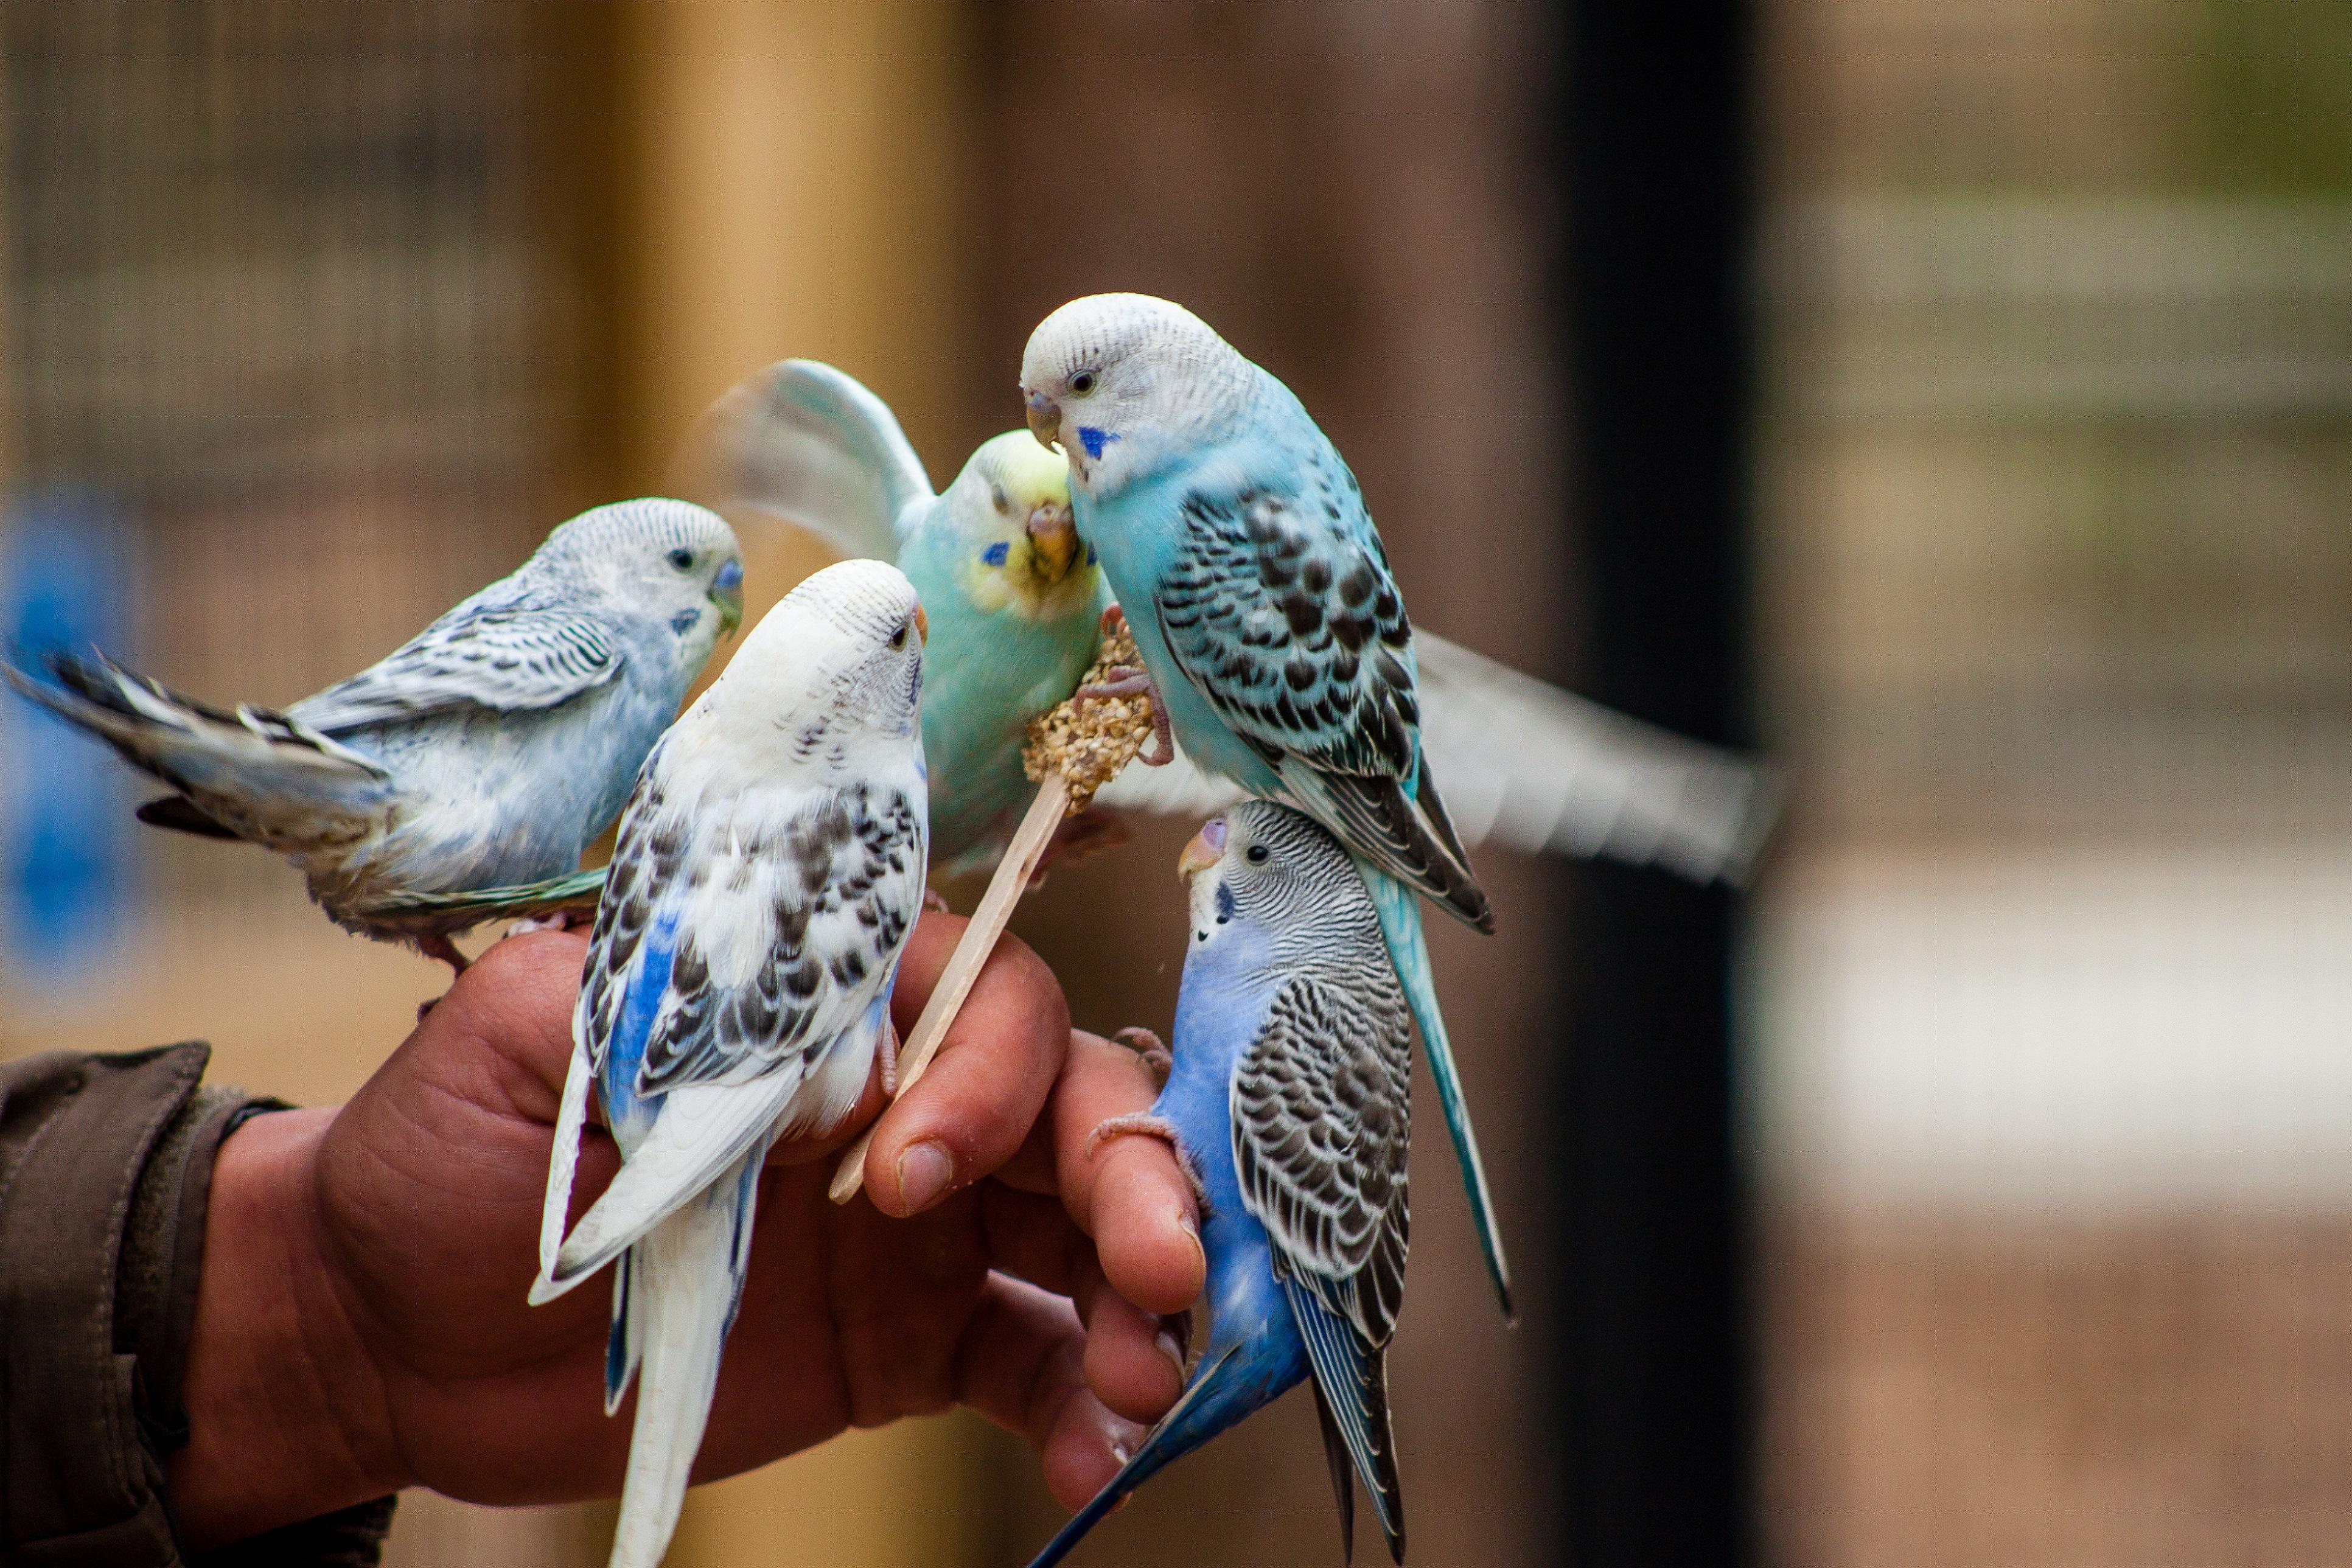 Feeding_Parakeets2_KG_Lubbock